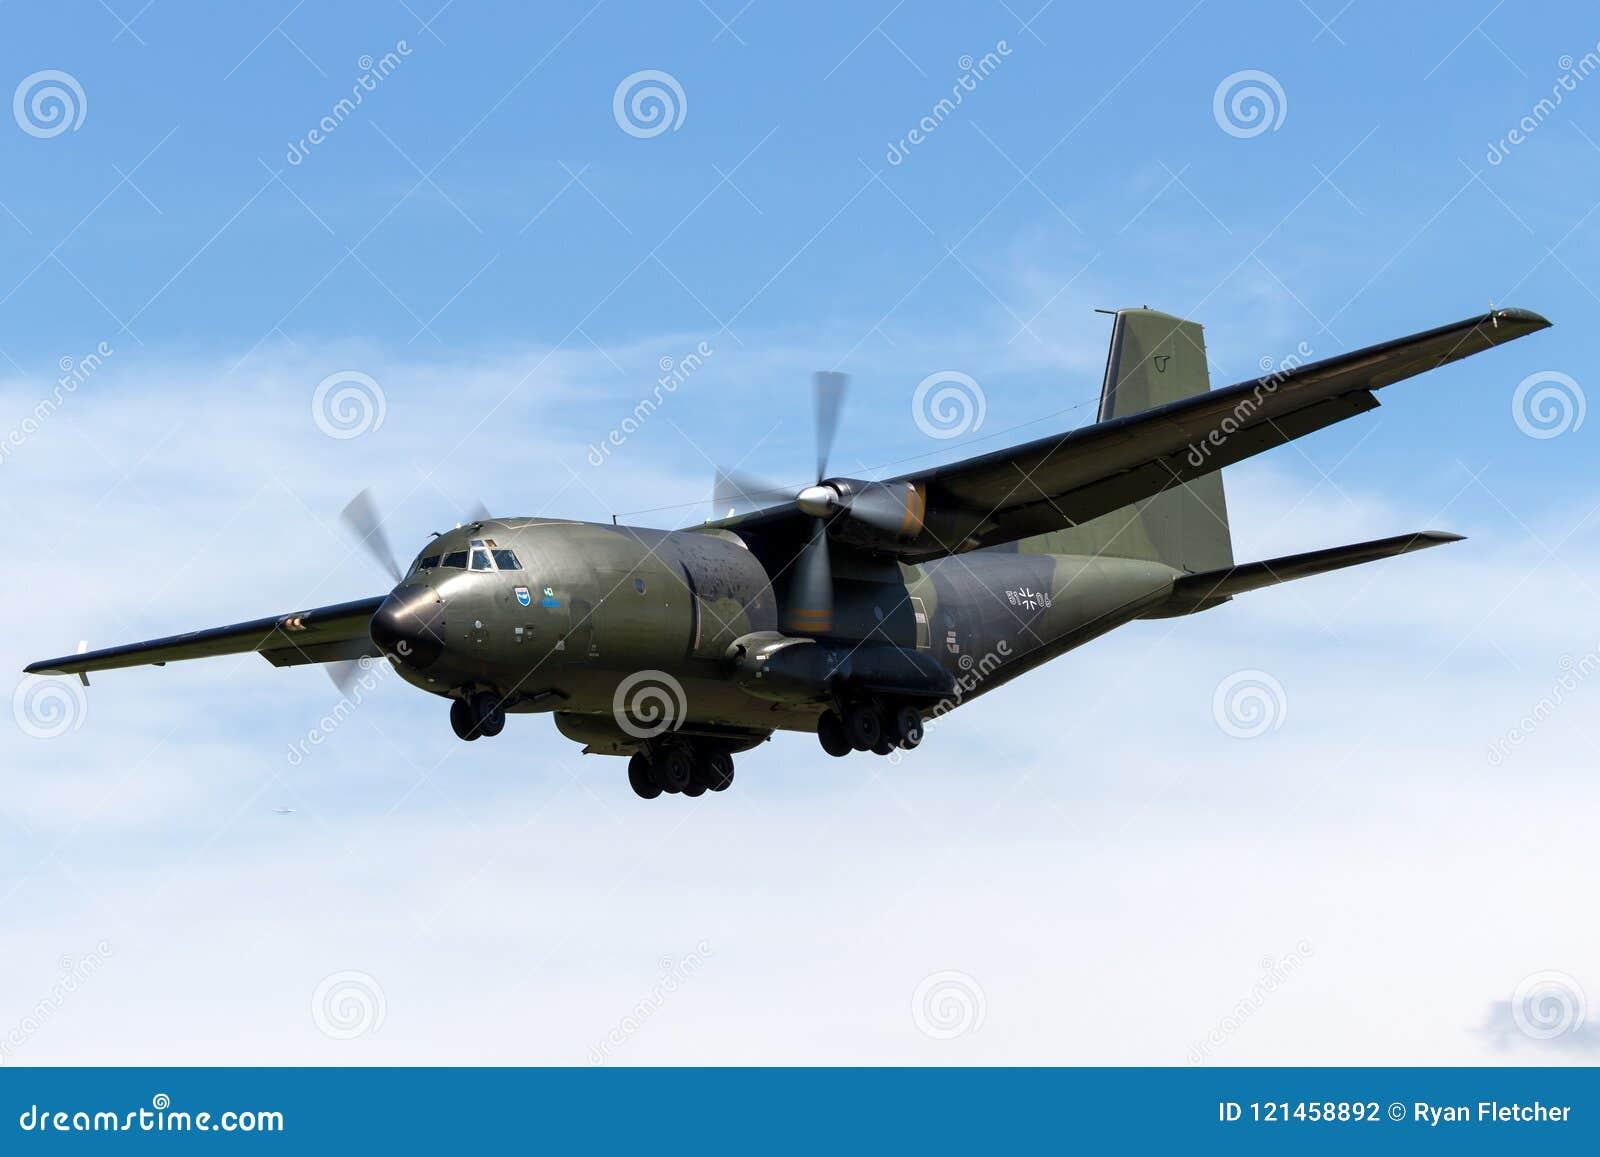 German Air Force Luftwaffe Transall C-160D Twin Engine Military